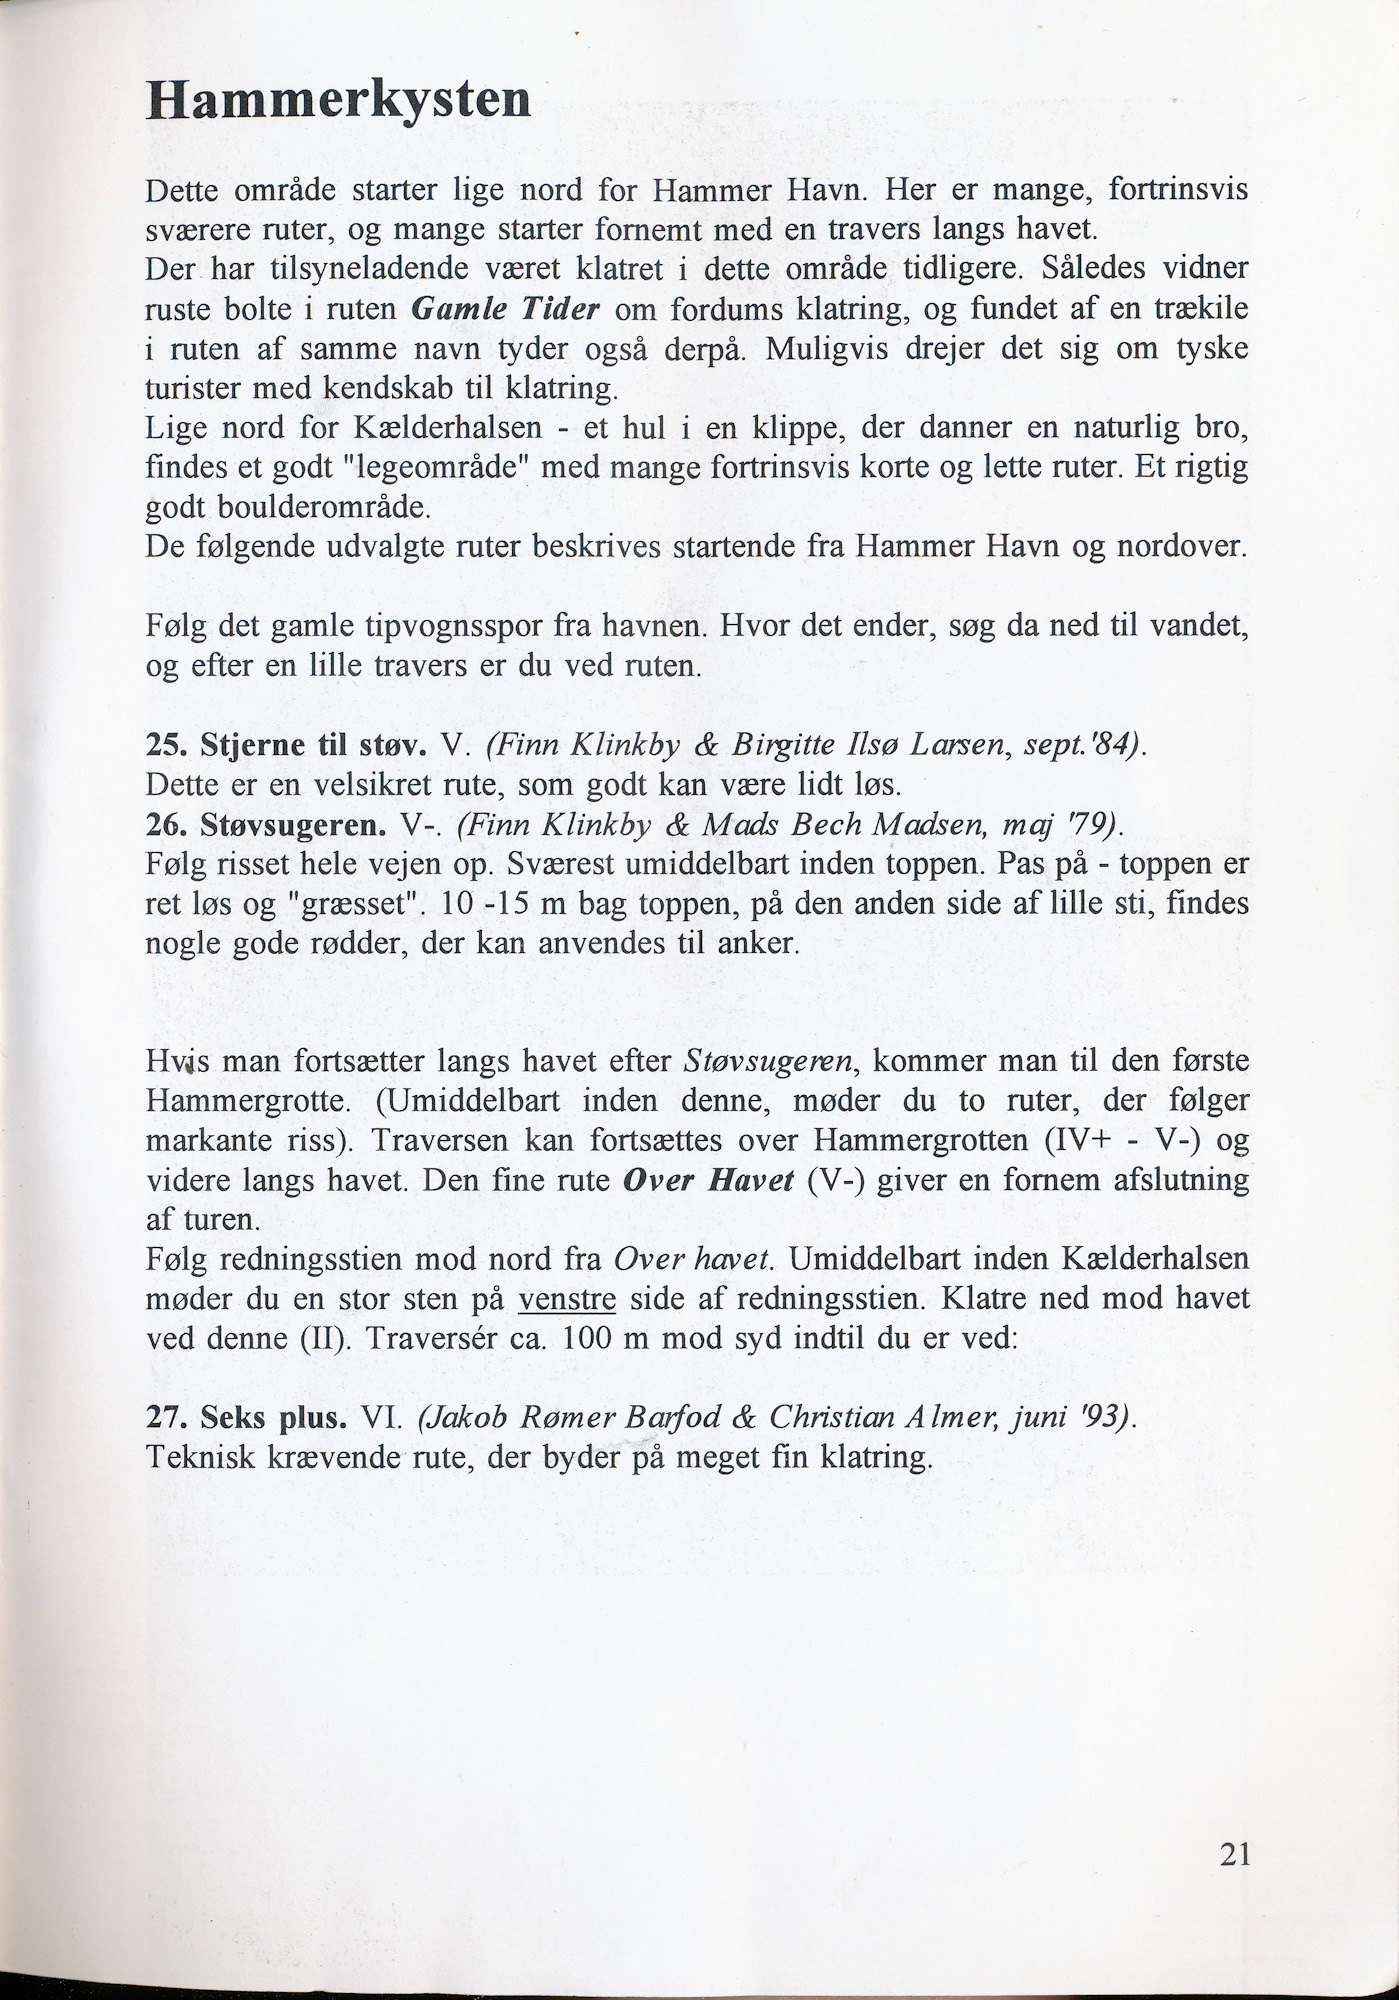 50 udvalgte ruter paa bornholm 1995 21.jpg